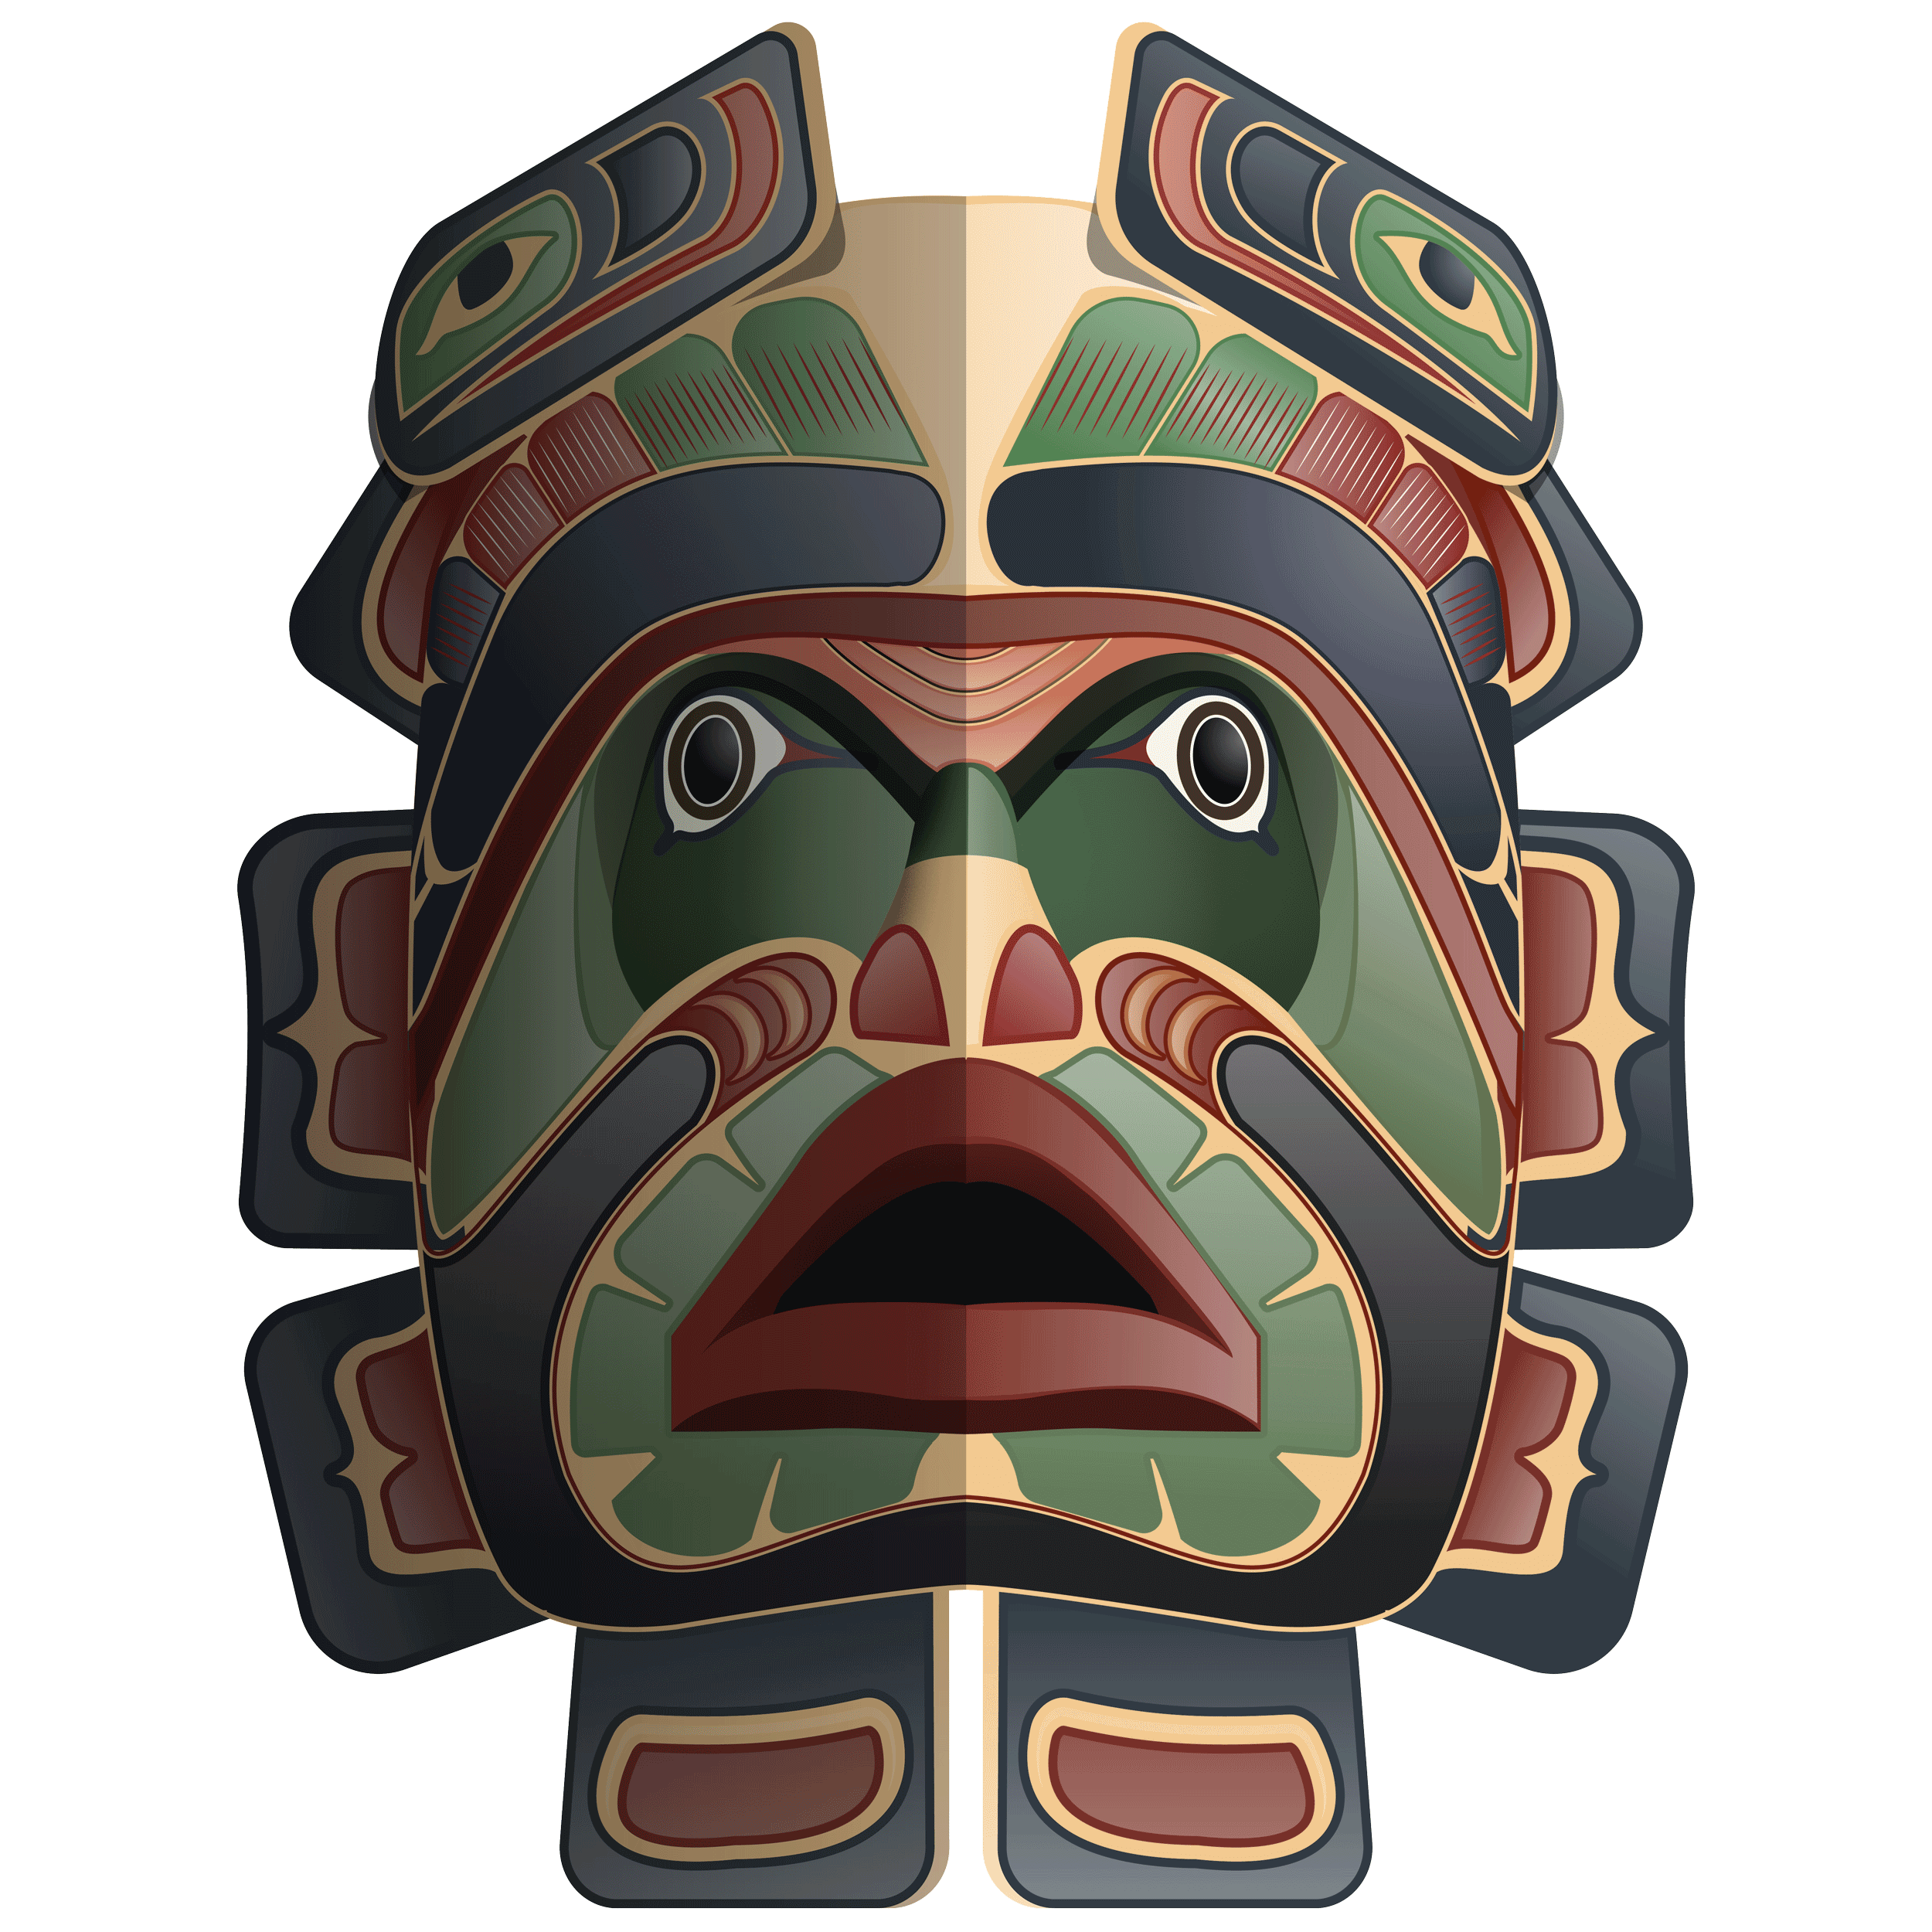 Masks clip art best. Mask clipart native american